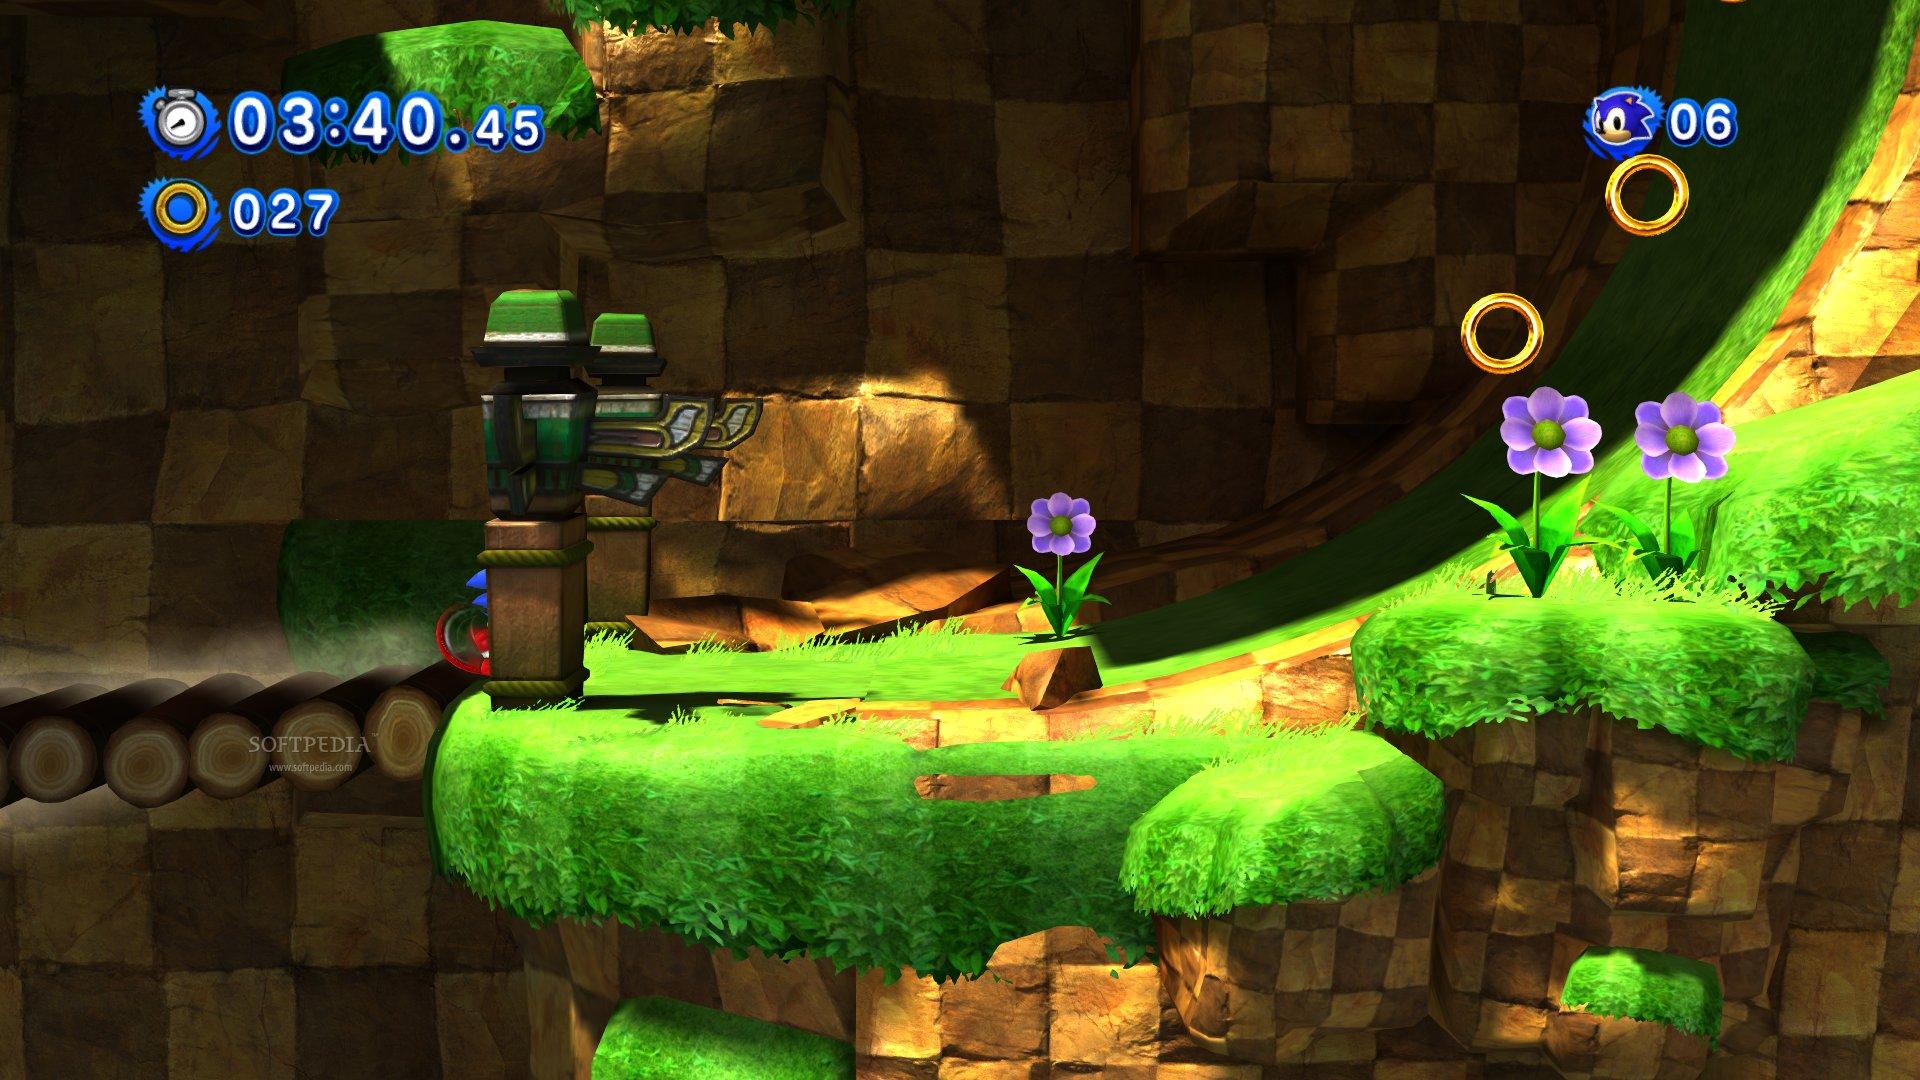 Sonic Generations Demo Download